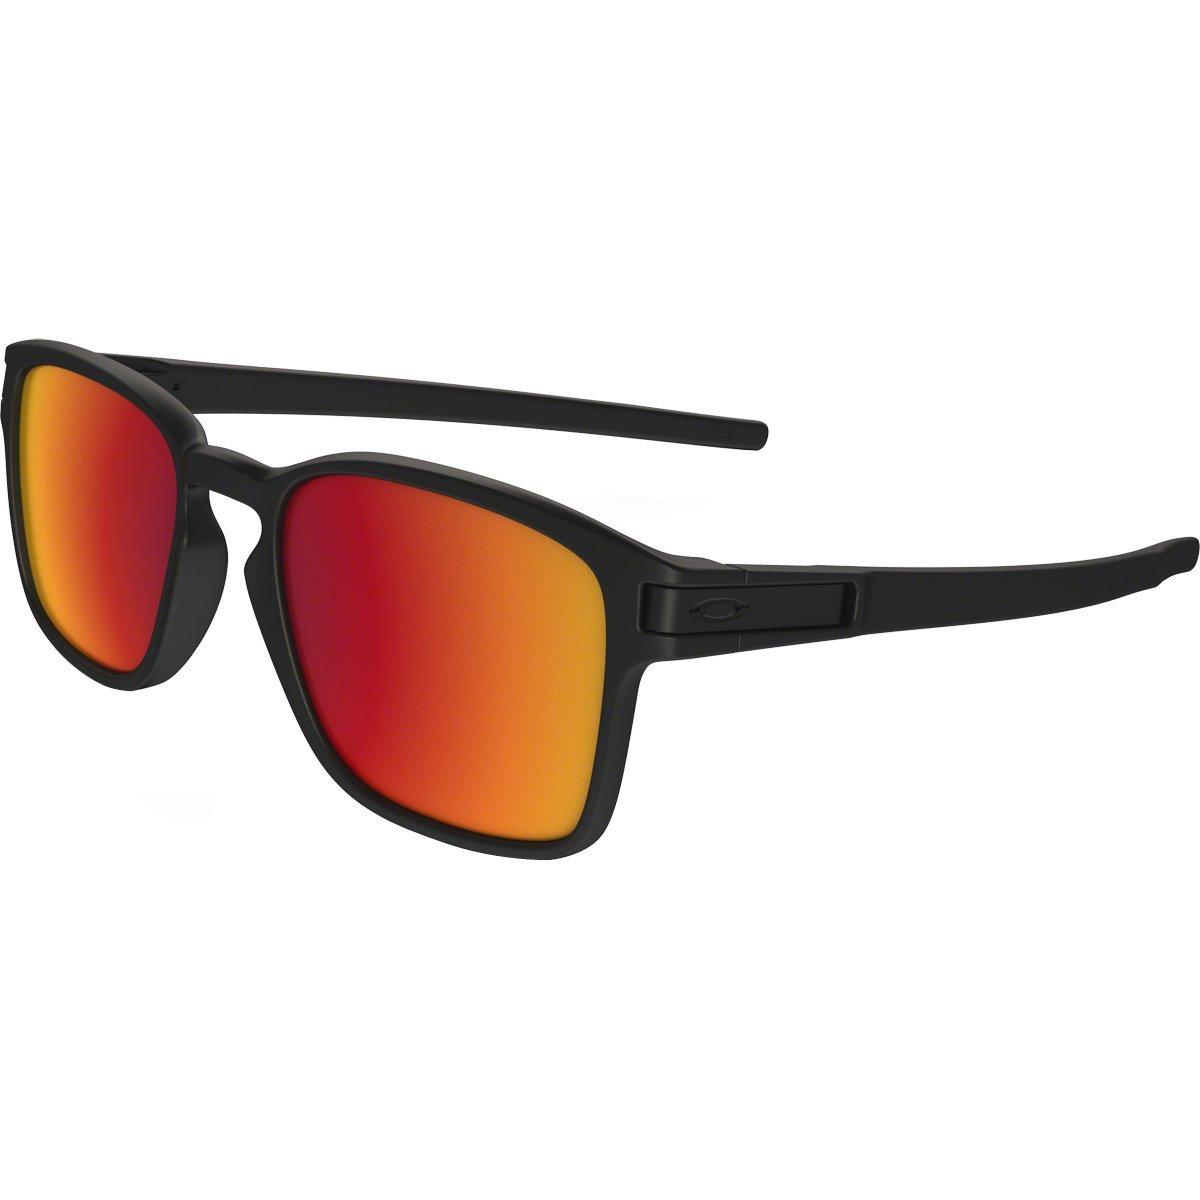 Oakley Men's Latch Squared Non-Polarized Iridium Rectangular Sunglasses, Matte Black w/Torch Iridium, 52 mm